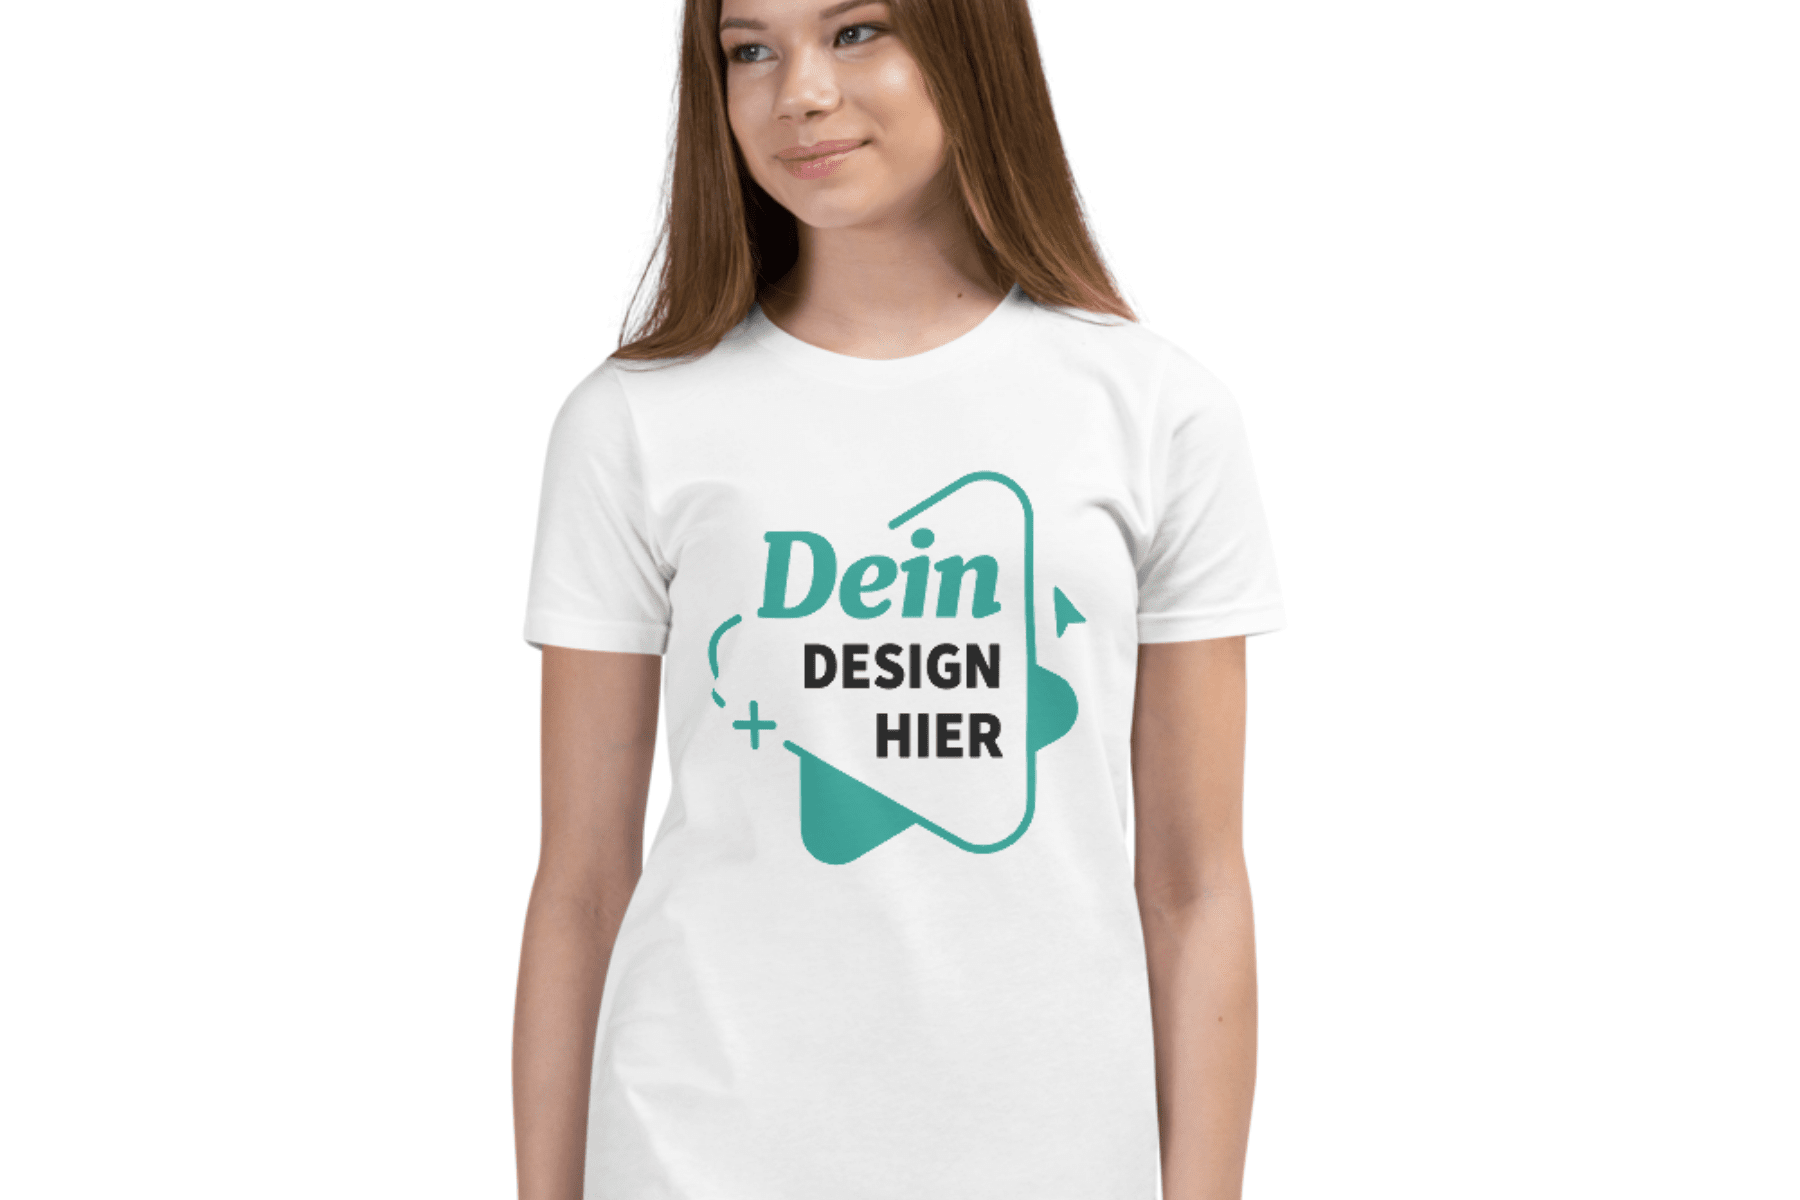 Kids t-shirt for school